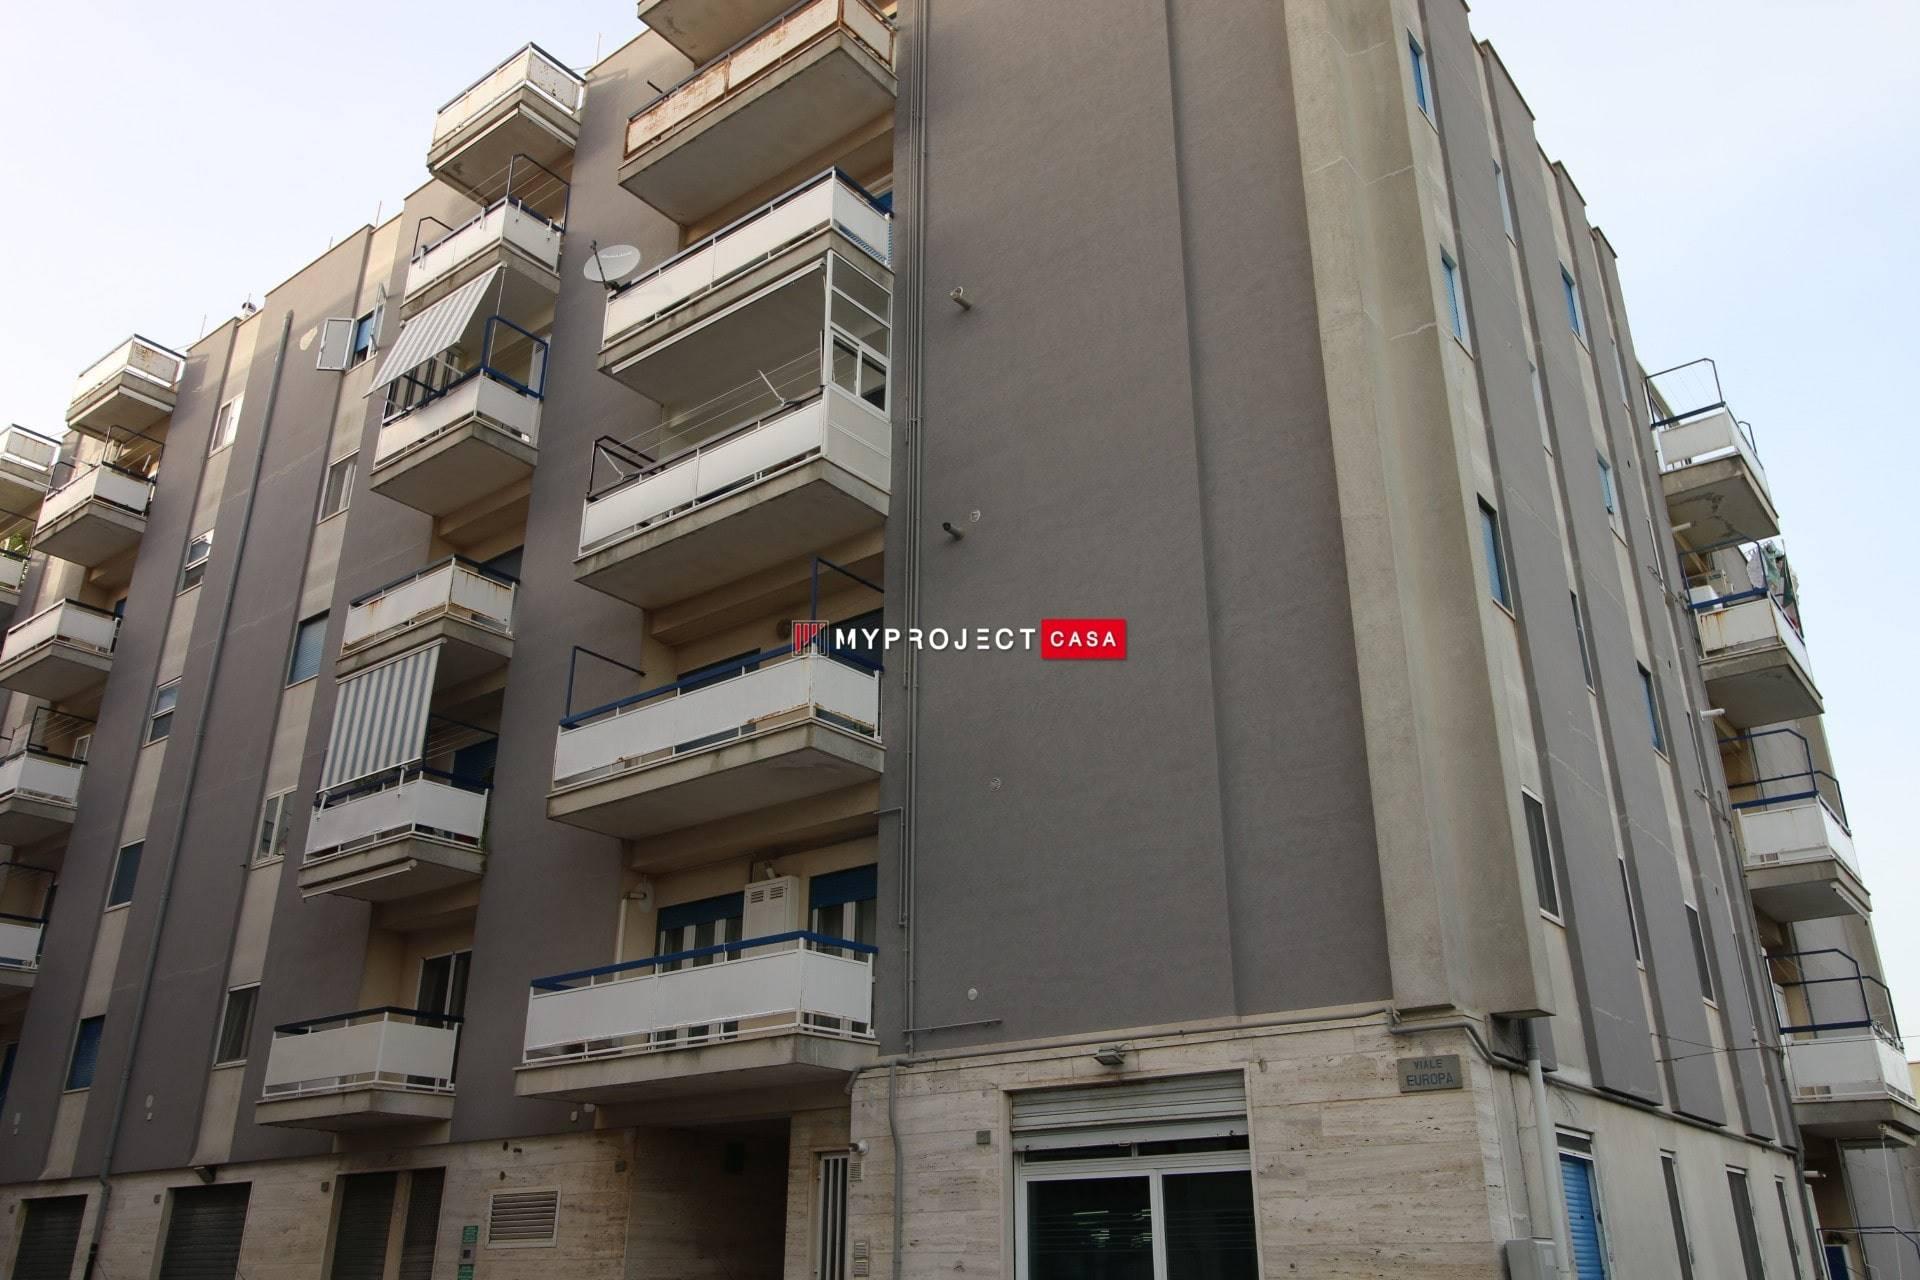 Appartamento arredato Martina Franca